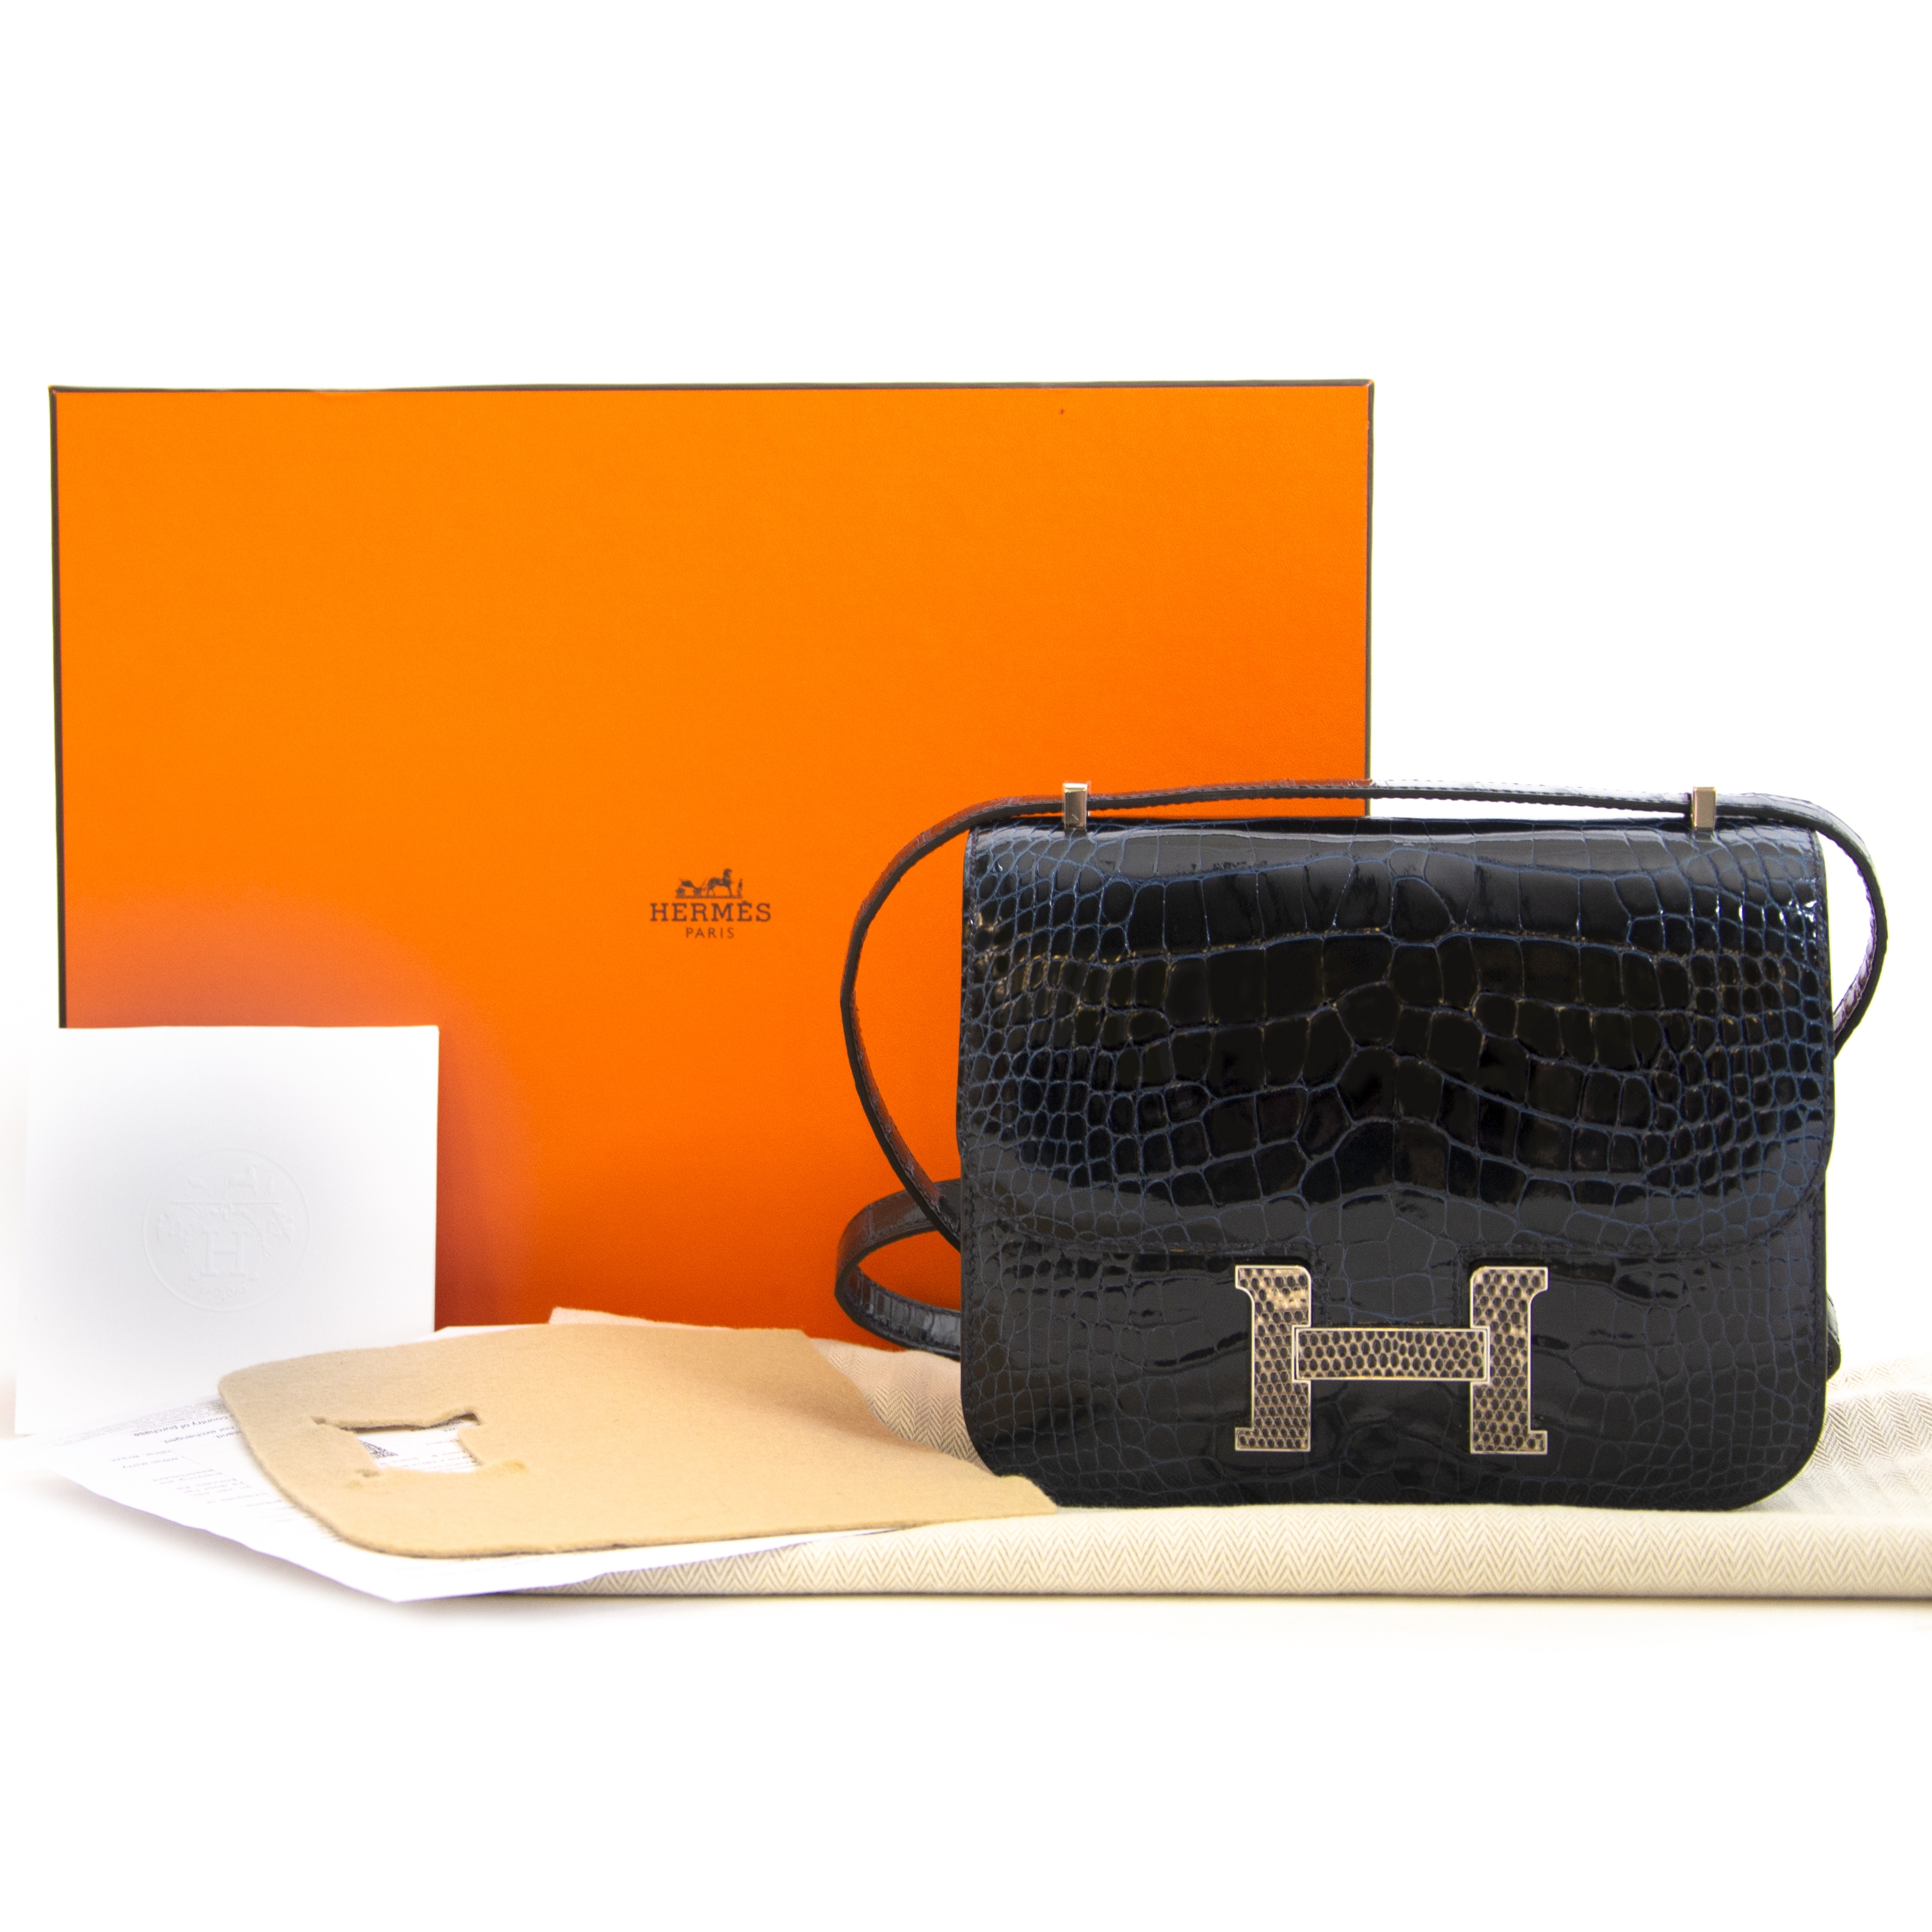 0f2ae3d75c ... online exclusive Hermès Constance 18 Mini Marquete Alligator Miss Lisse    Lezard Bleu Marine Ombre kopen en verkopen · Hermes